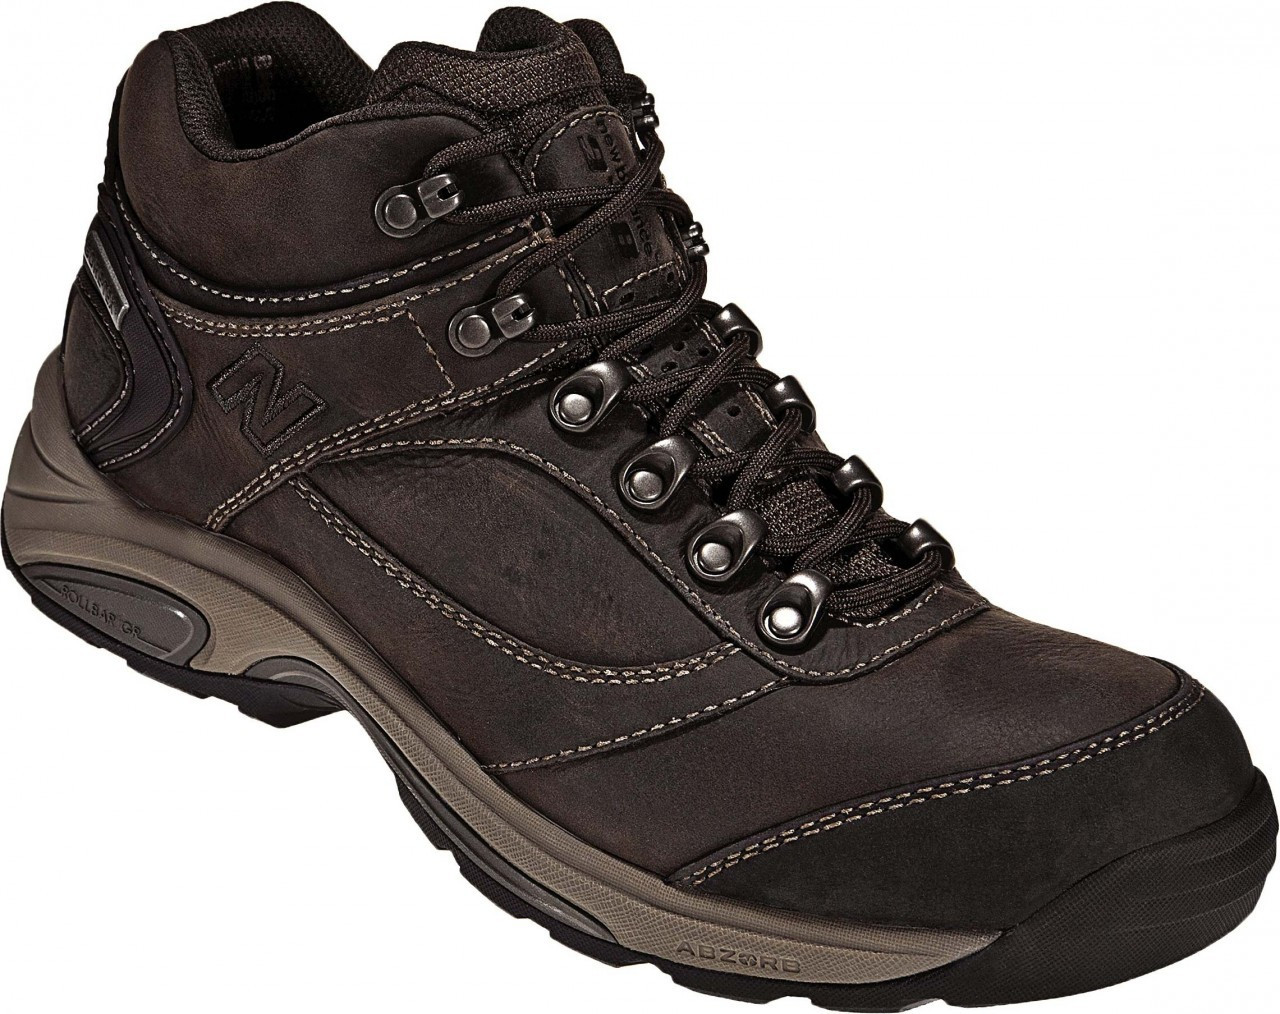 New Balance 978 Trail Shoe Mw978gt